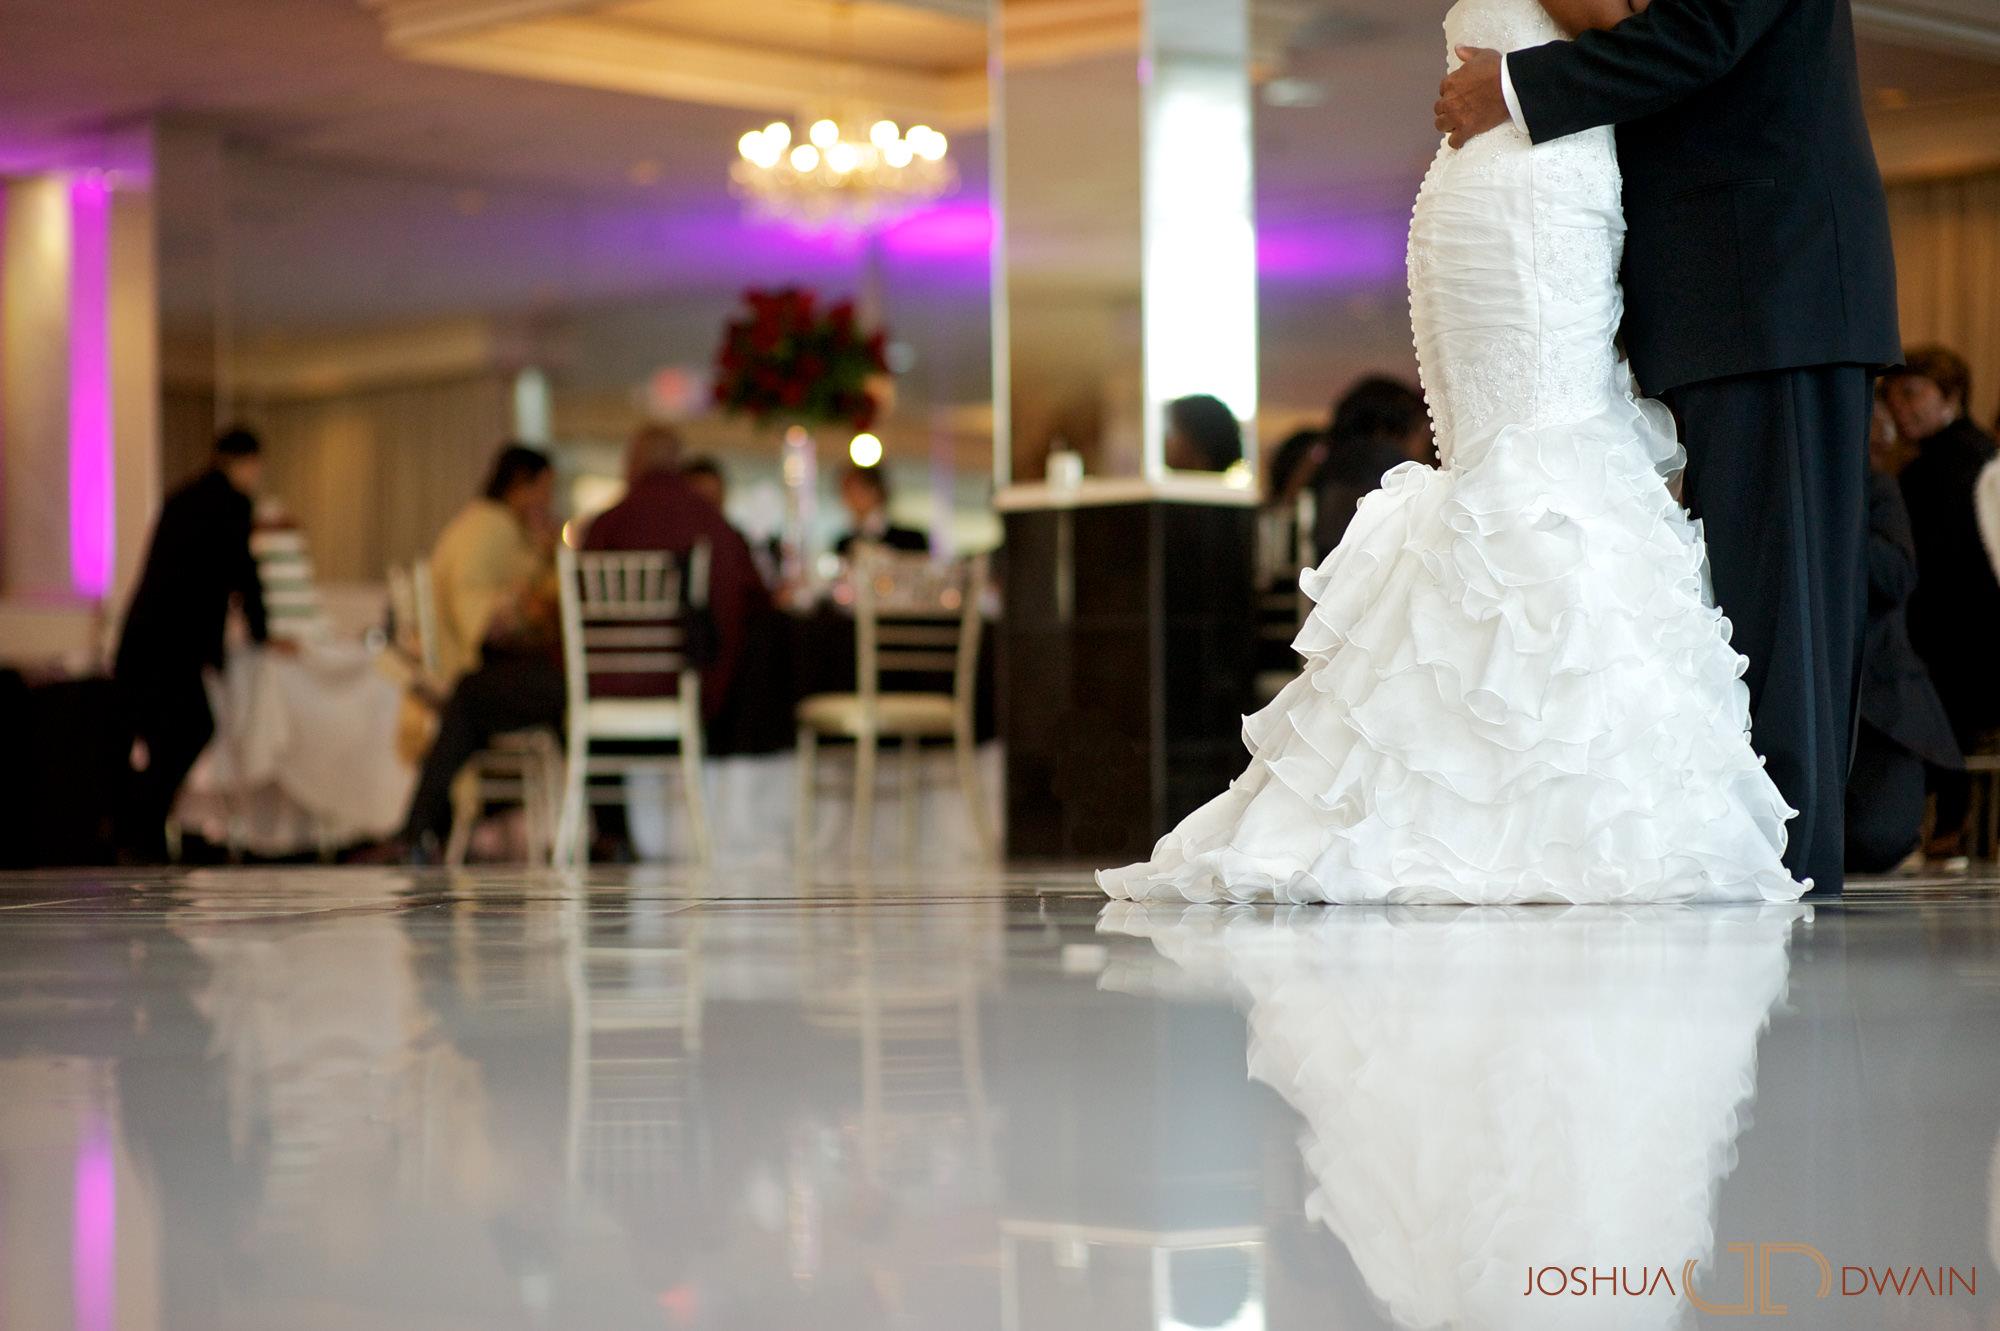 natifia-don-018-greentree-country-clubnew-rochelle-new-york-wedding-photographer-joshua-dwain-20101023_dn_0905